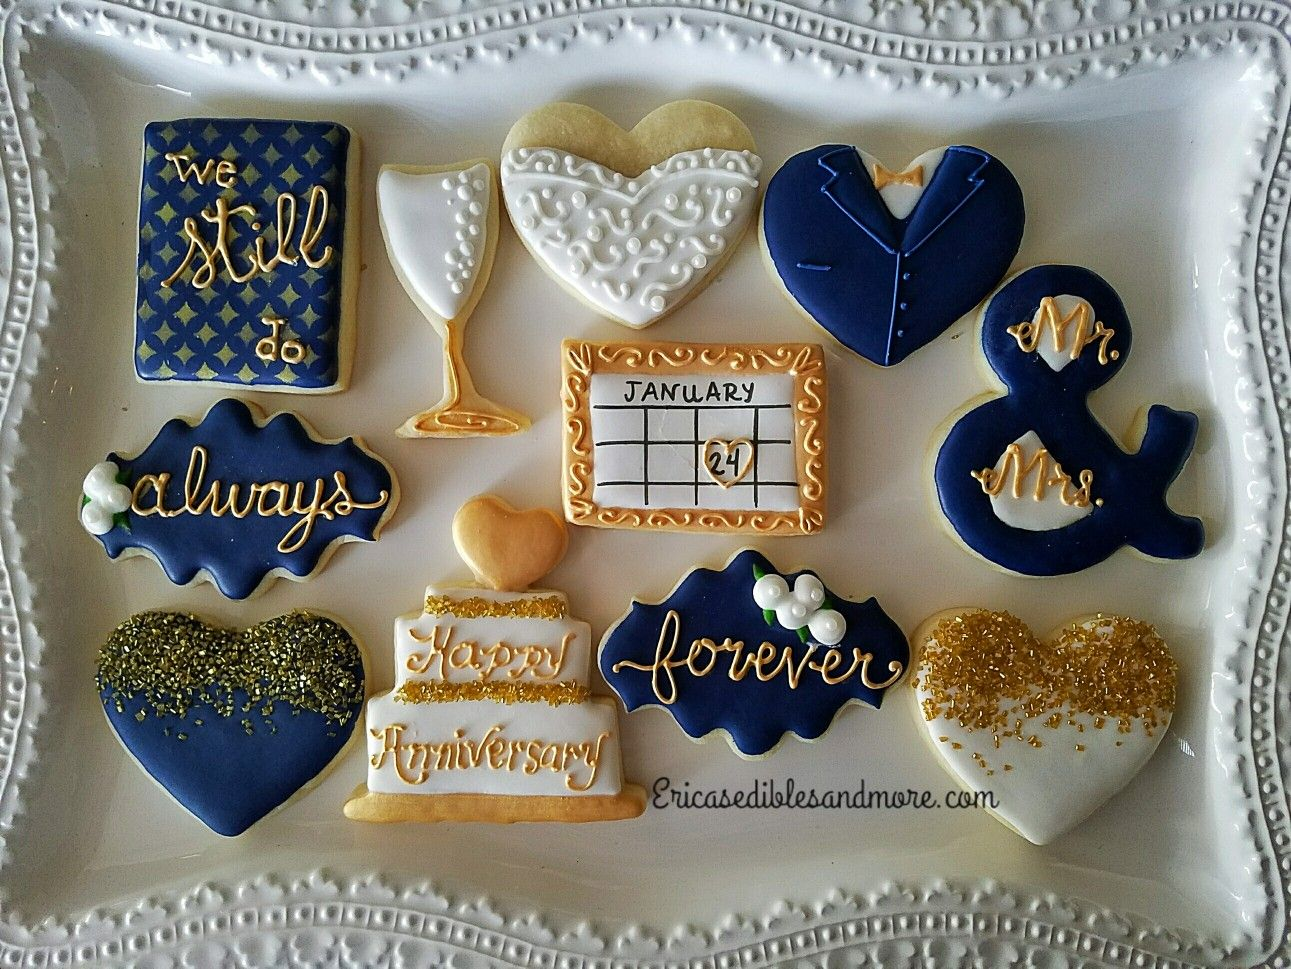 bridal/wedding theme cookiesericas. of erica's edibles